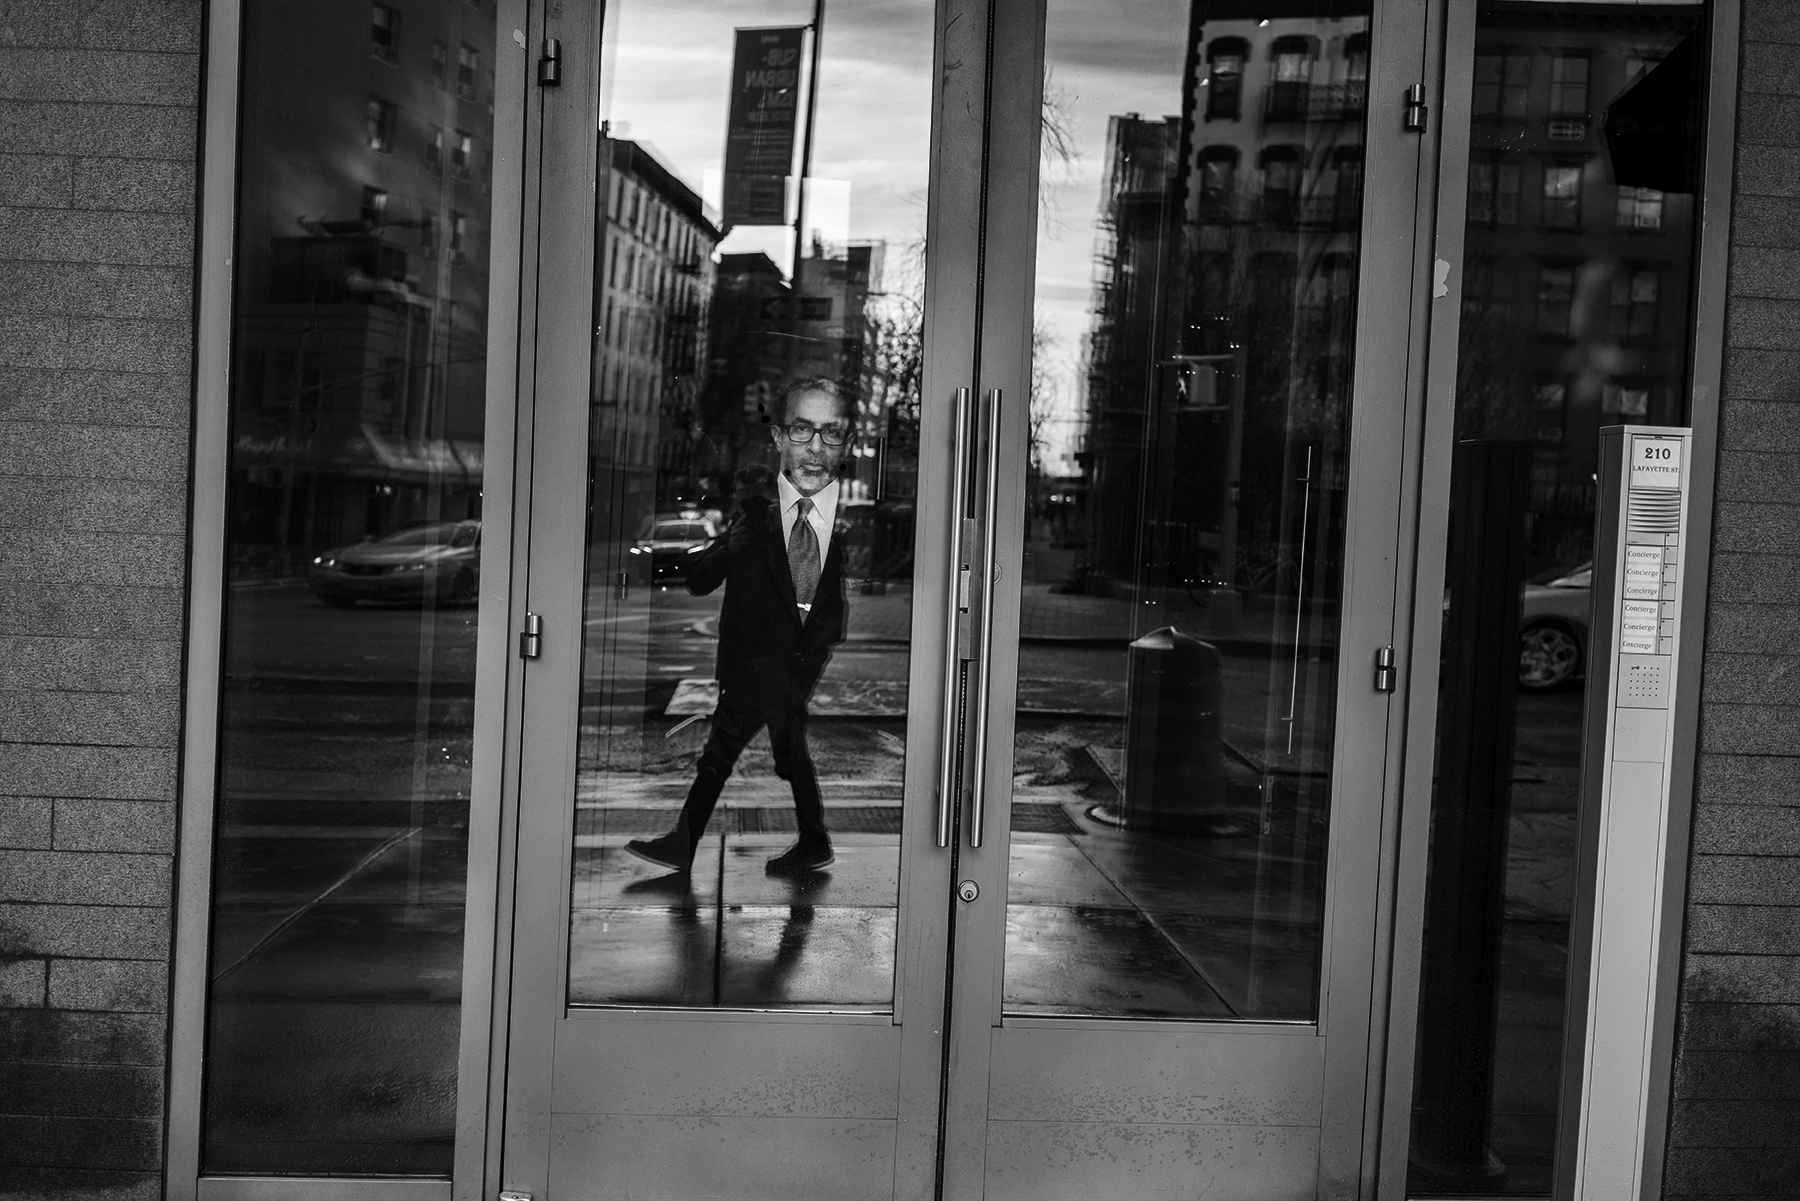 Doorman_Looking_Back_2106.jpg